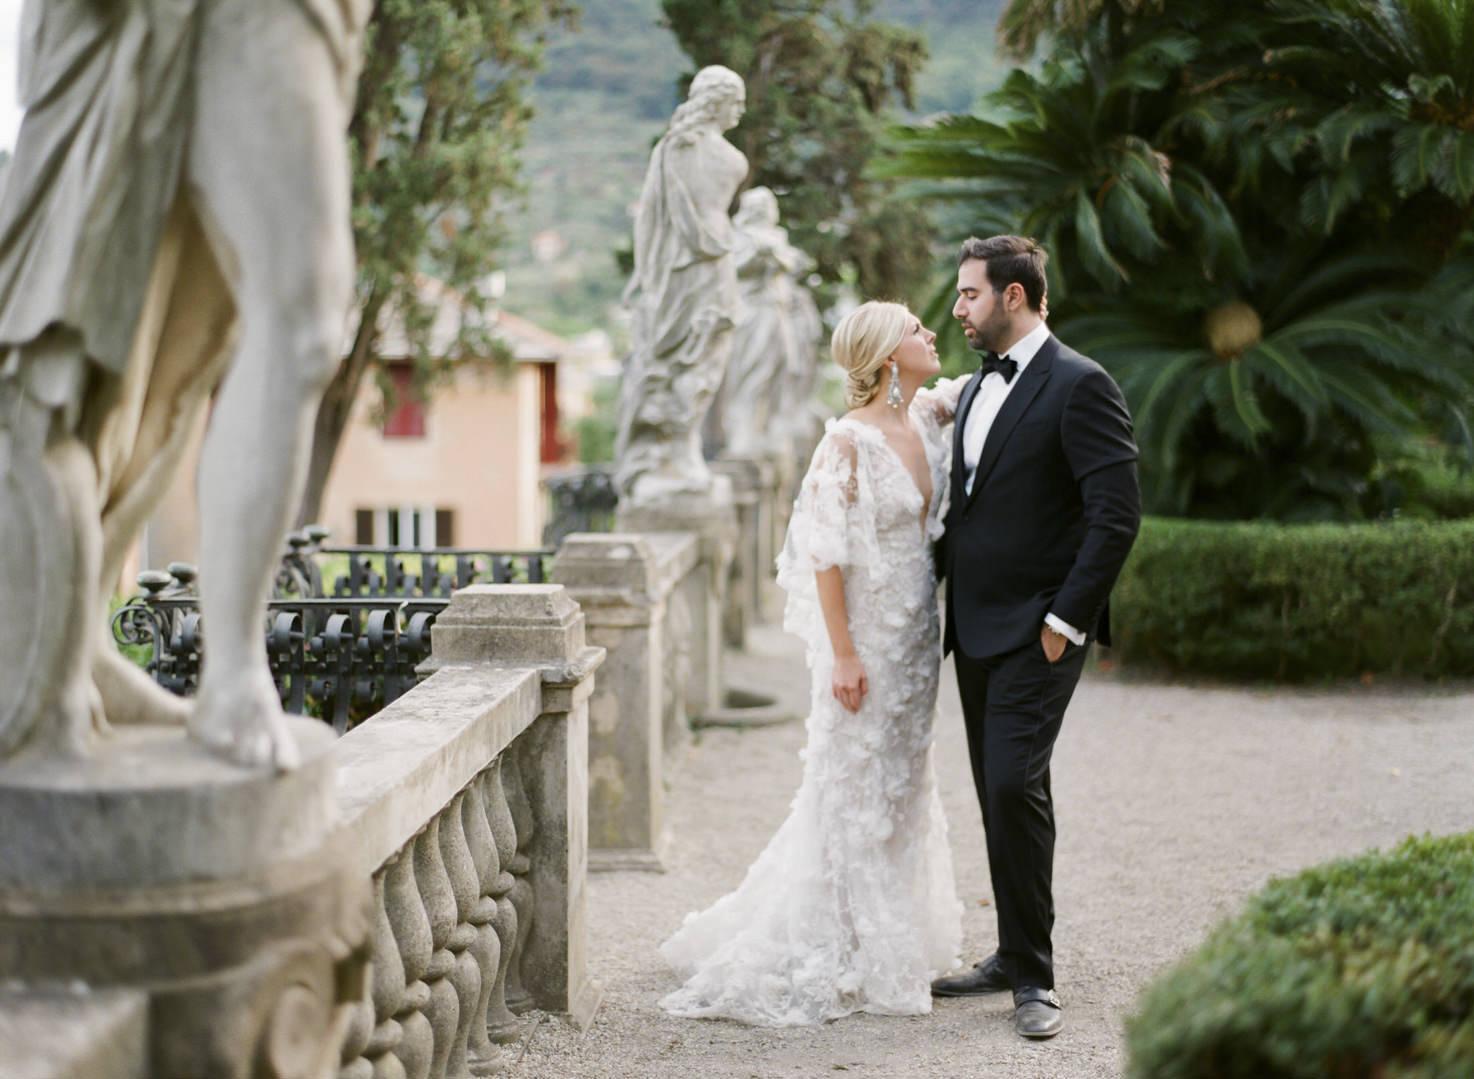 Bride and groom in the gardens of Villa Durazzo